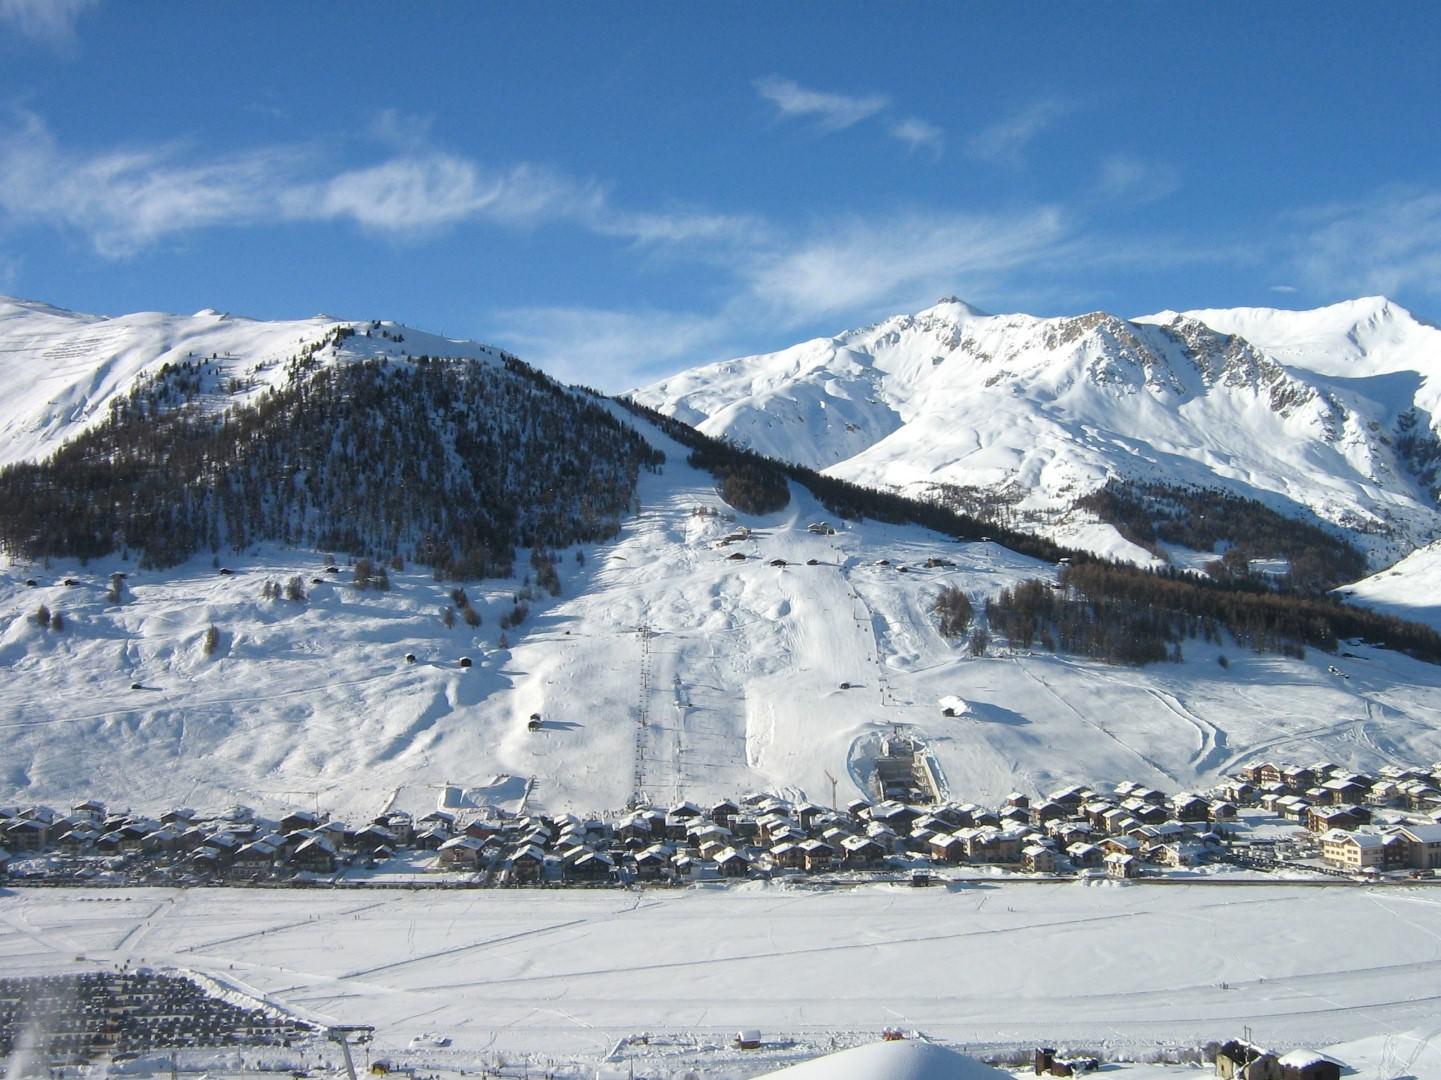 wintersport en aanbiedingen in Livigno